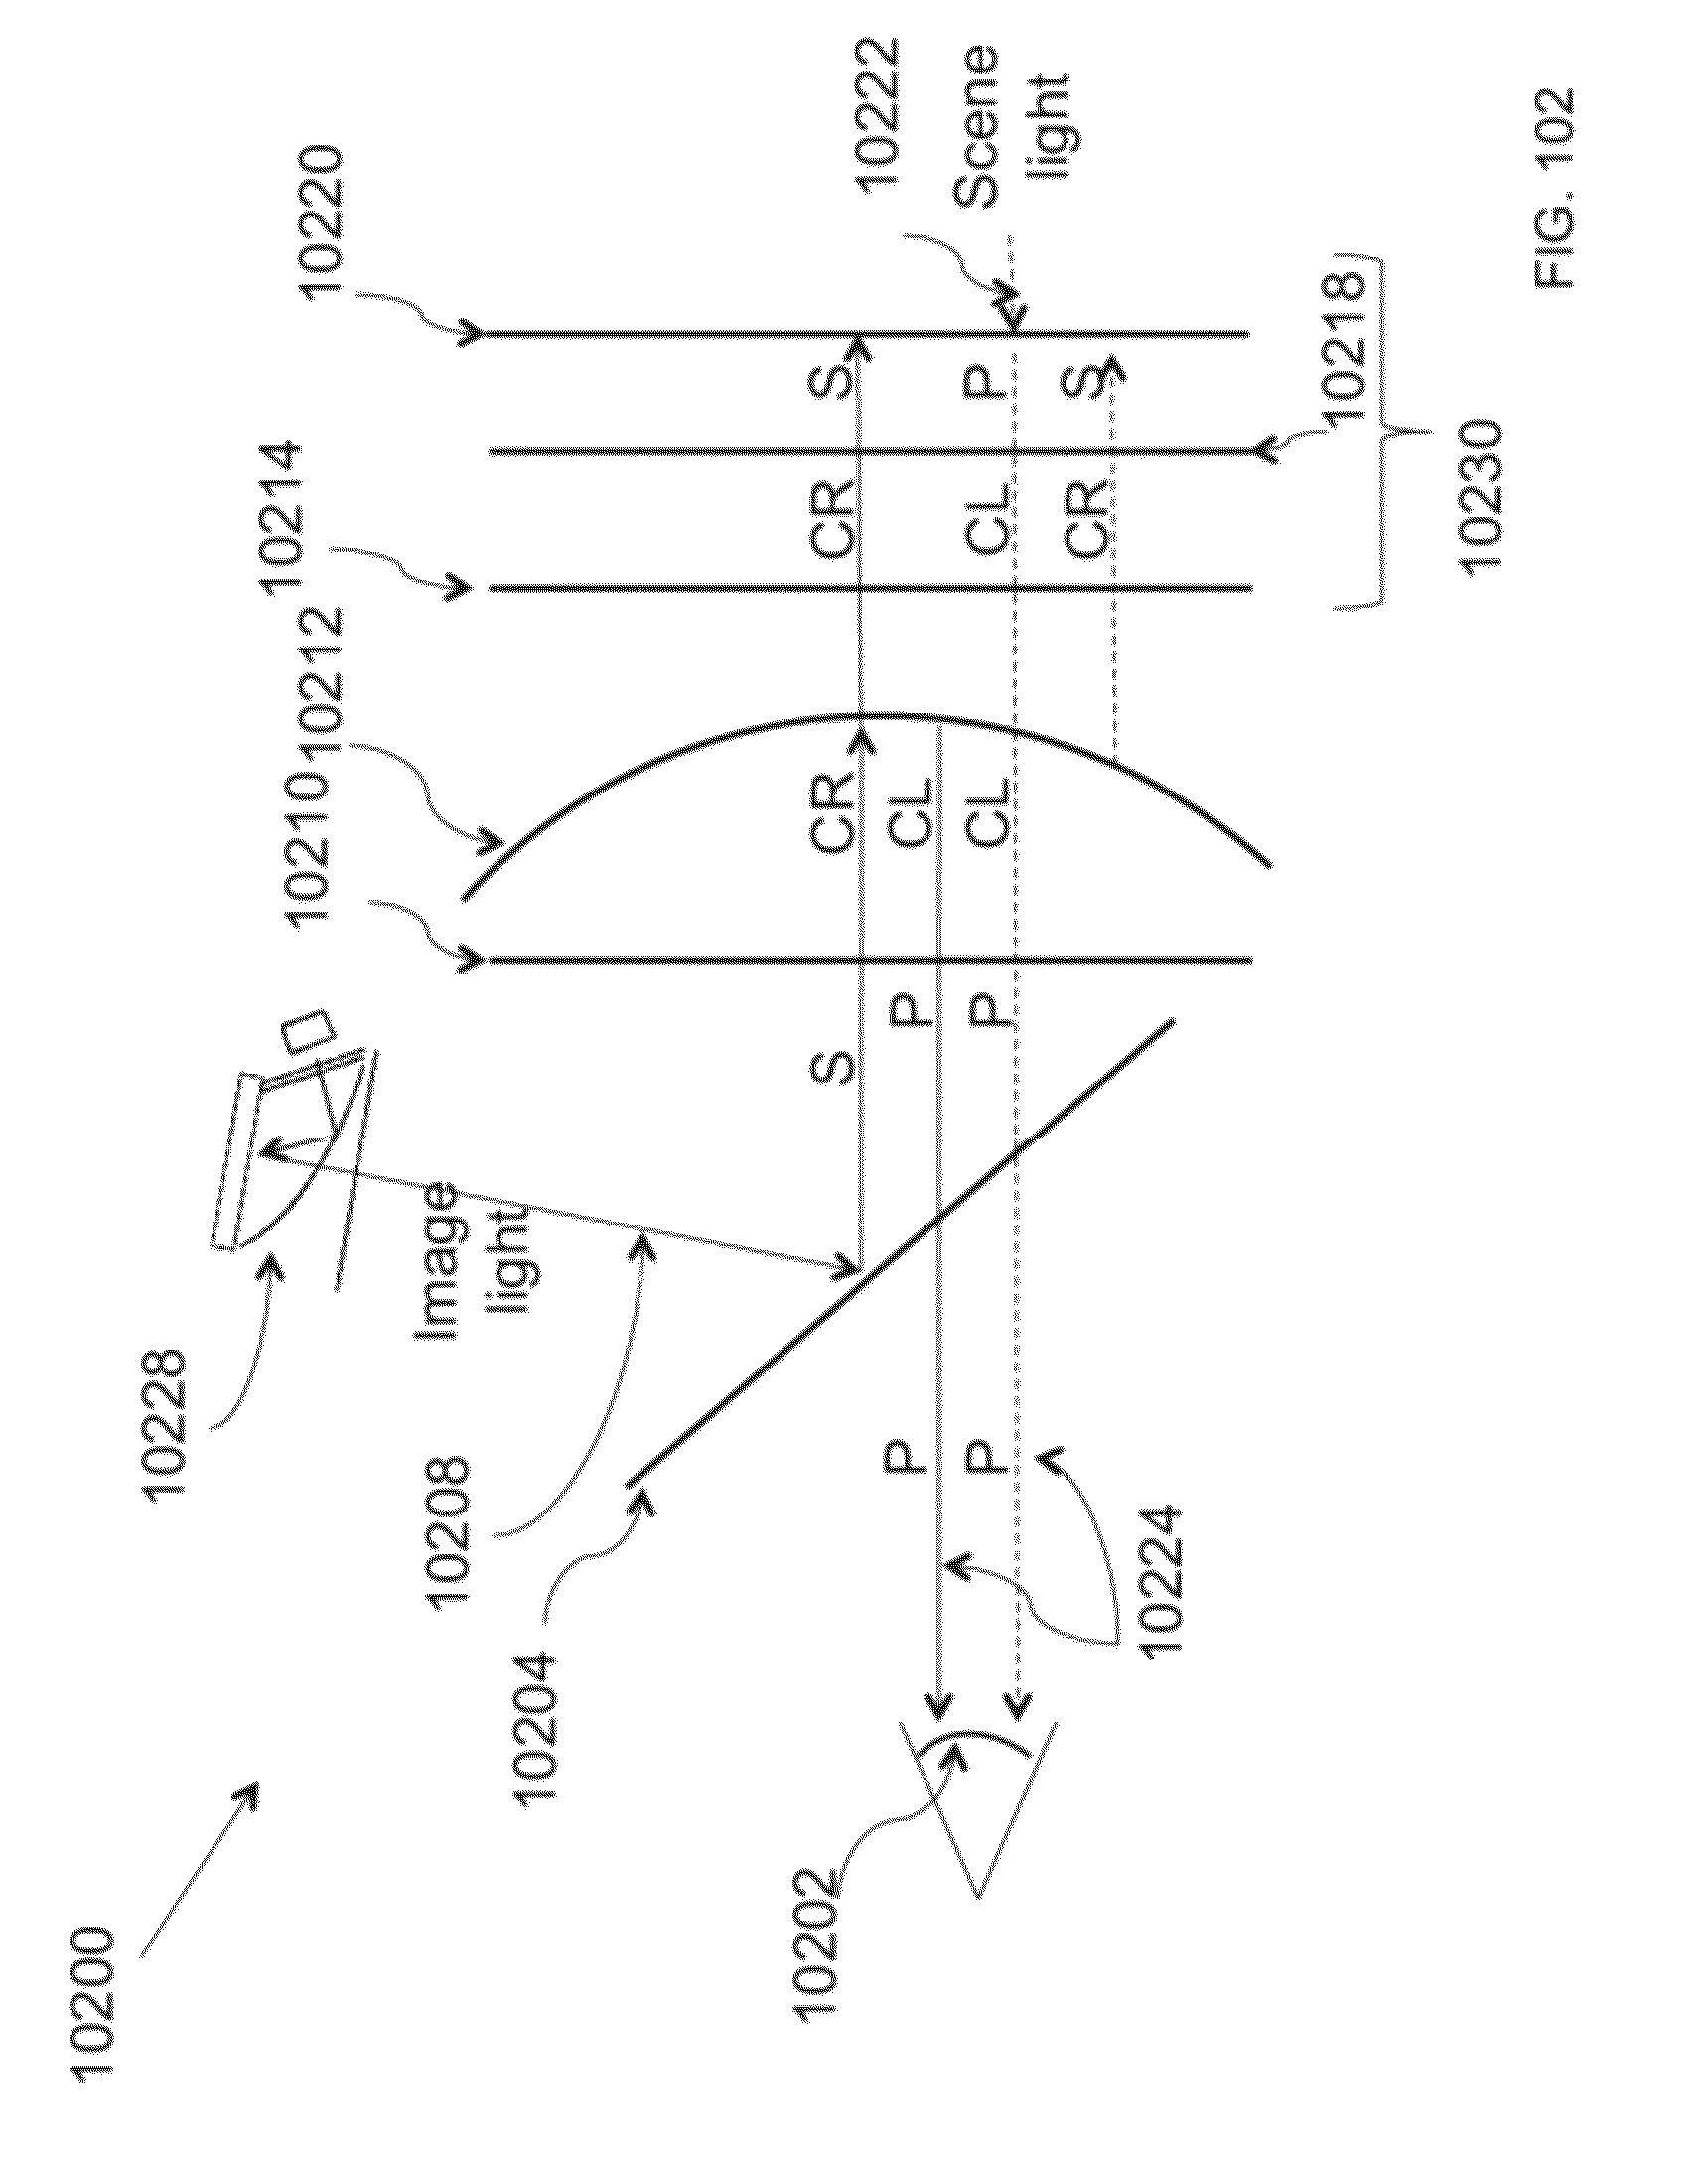 Patent US 9,182,596 B2